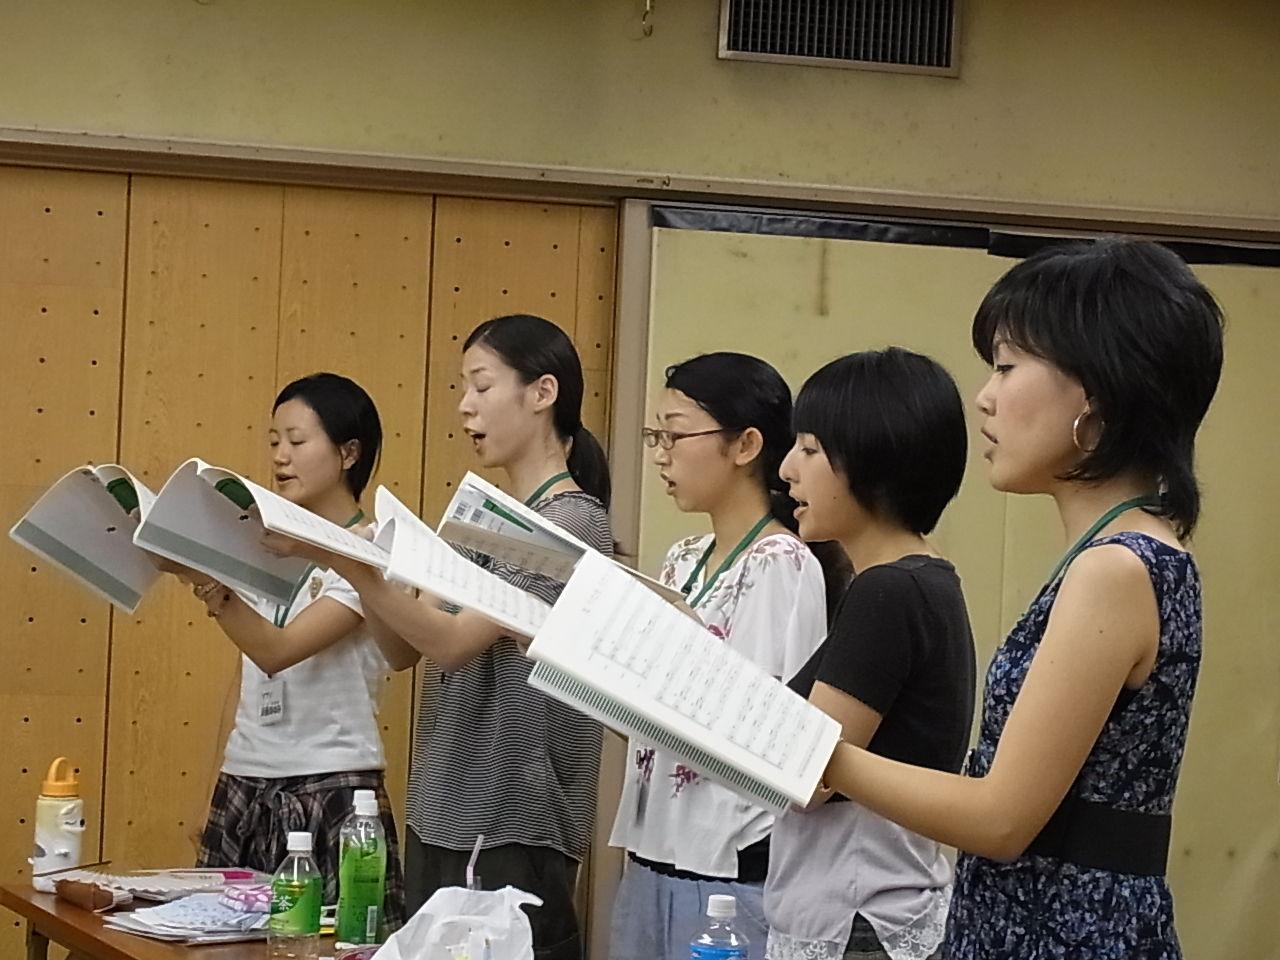 chorus_20110911-04「新しい歌」ソプラノ